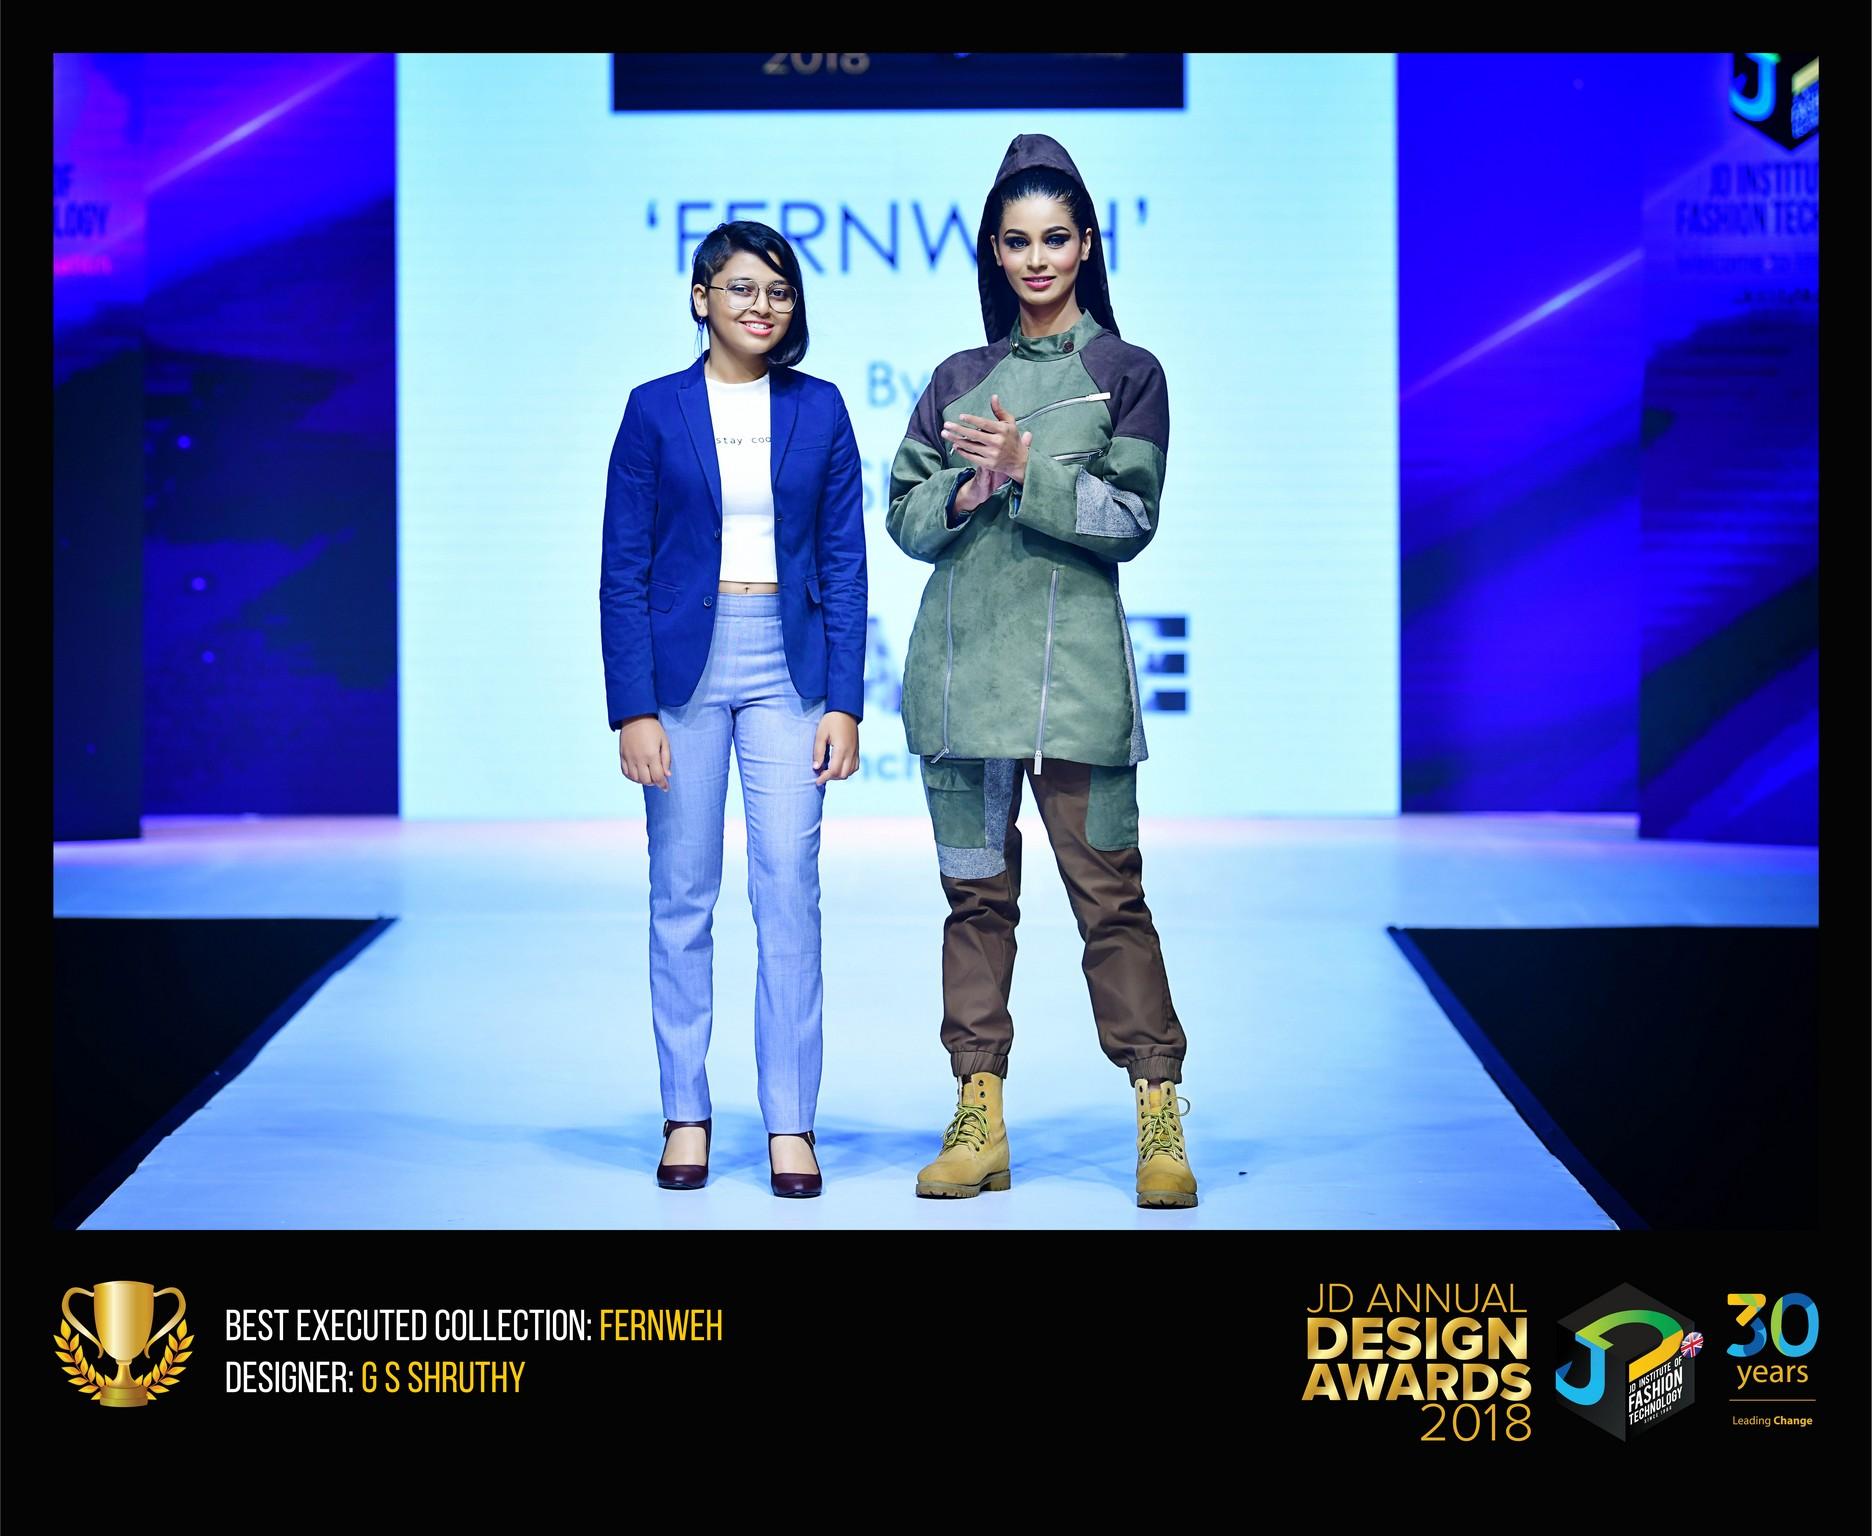 Fernweh – Change – JD Annual Design Awards 2018   Designer: G.S Shruthi (ADFD 2015 Batch)   Photography : Jerin Nath (@jerin_nath) fernweh - FERNWEH10 final - Fernweh – Change – JD Annual Design Awards 2018